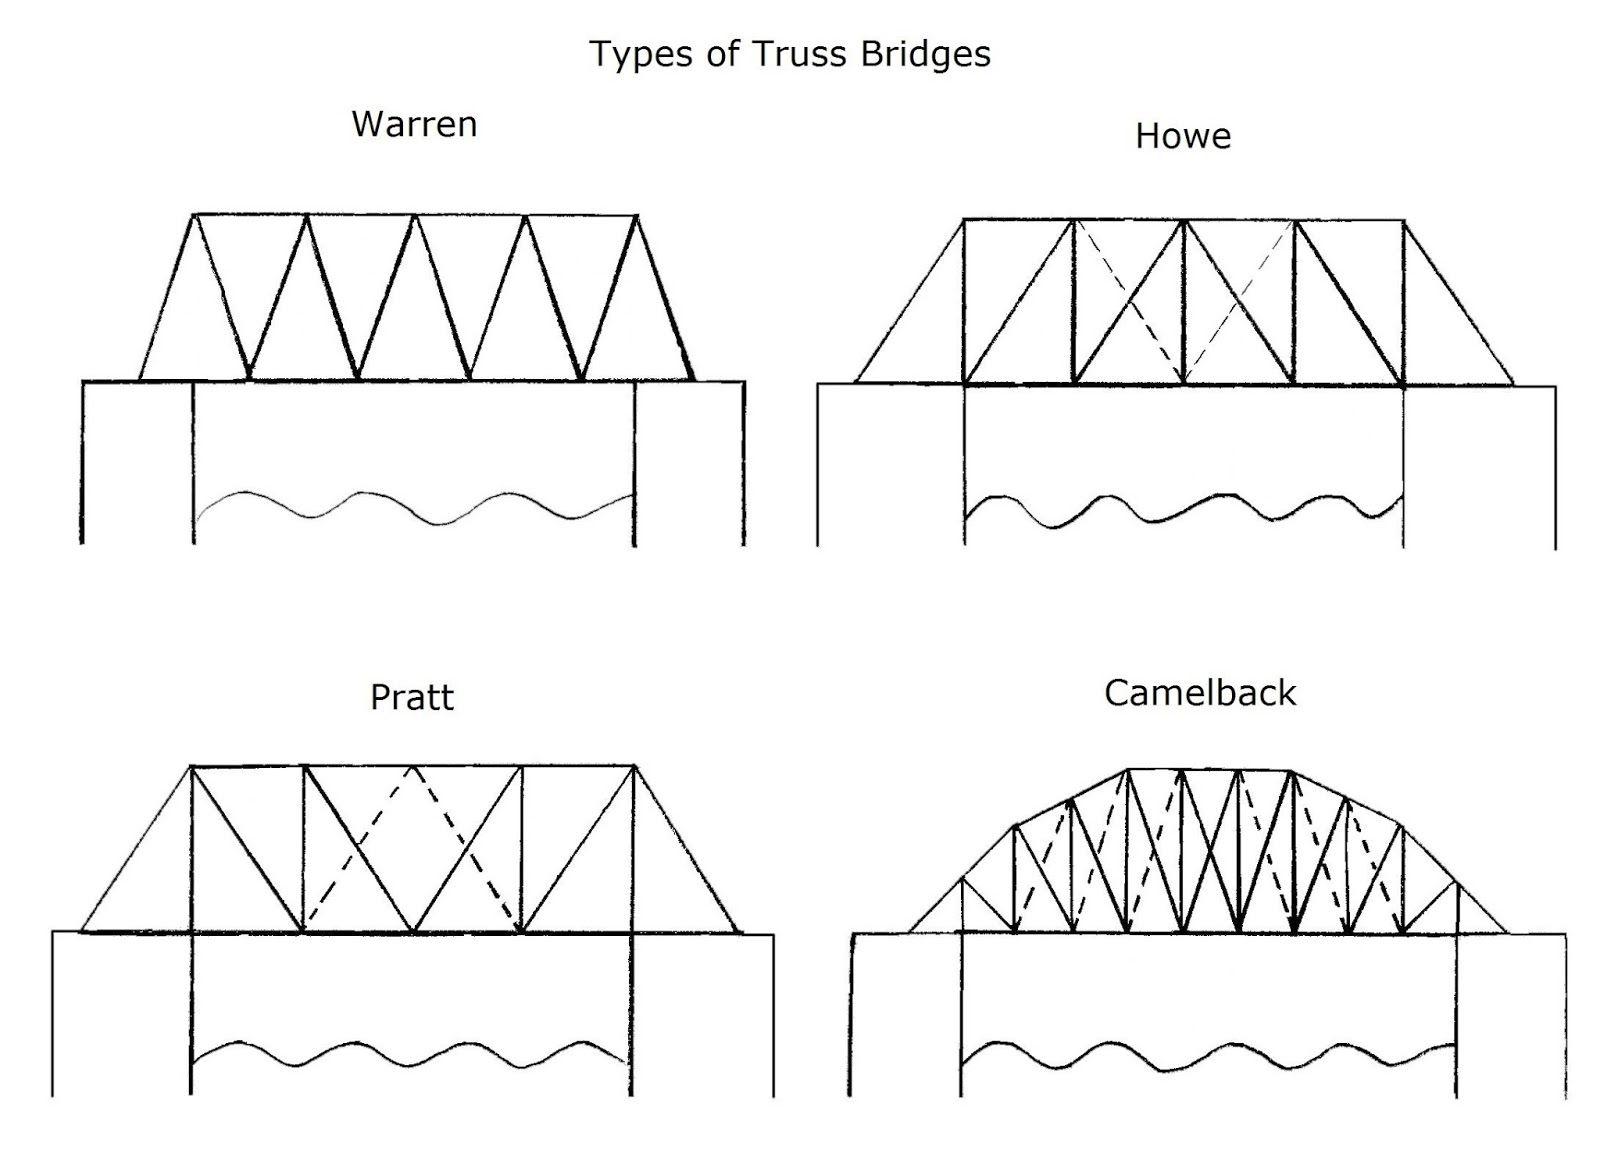 Truss Bridges A Truss Bridge Is A Bridge That Bears Its Weight Through Its Truss System This Truss System Is Composed Paper Bridge Truss Bridge Bridge Design